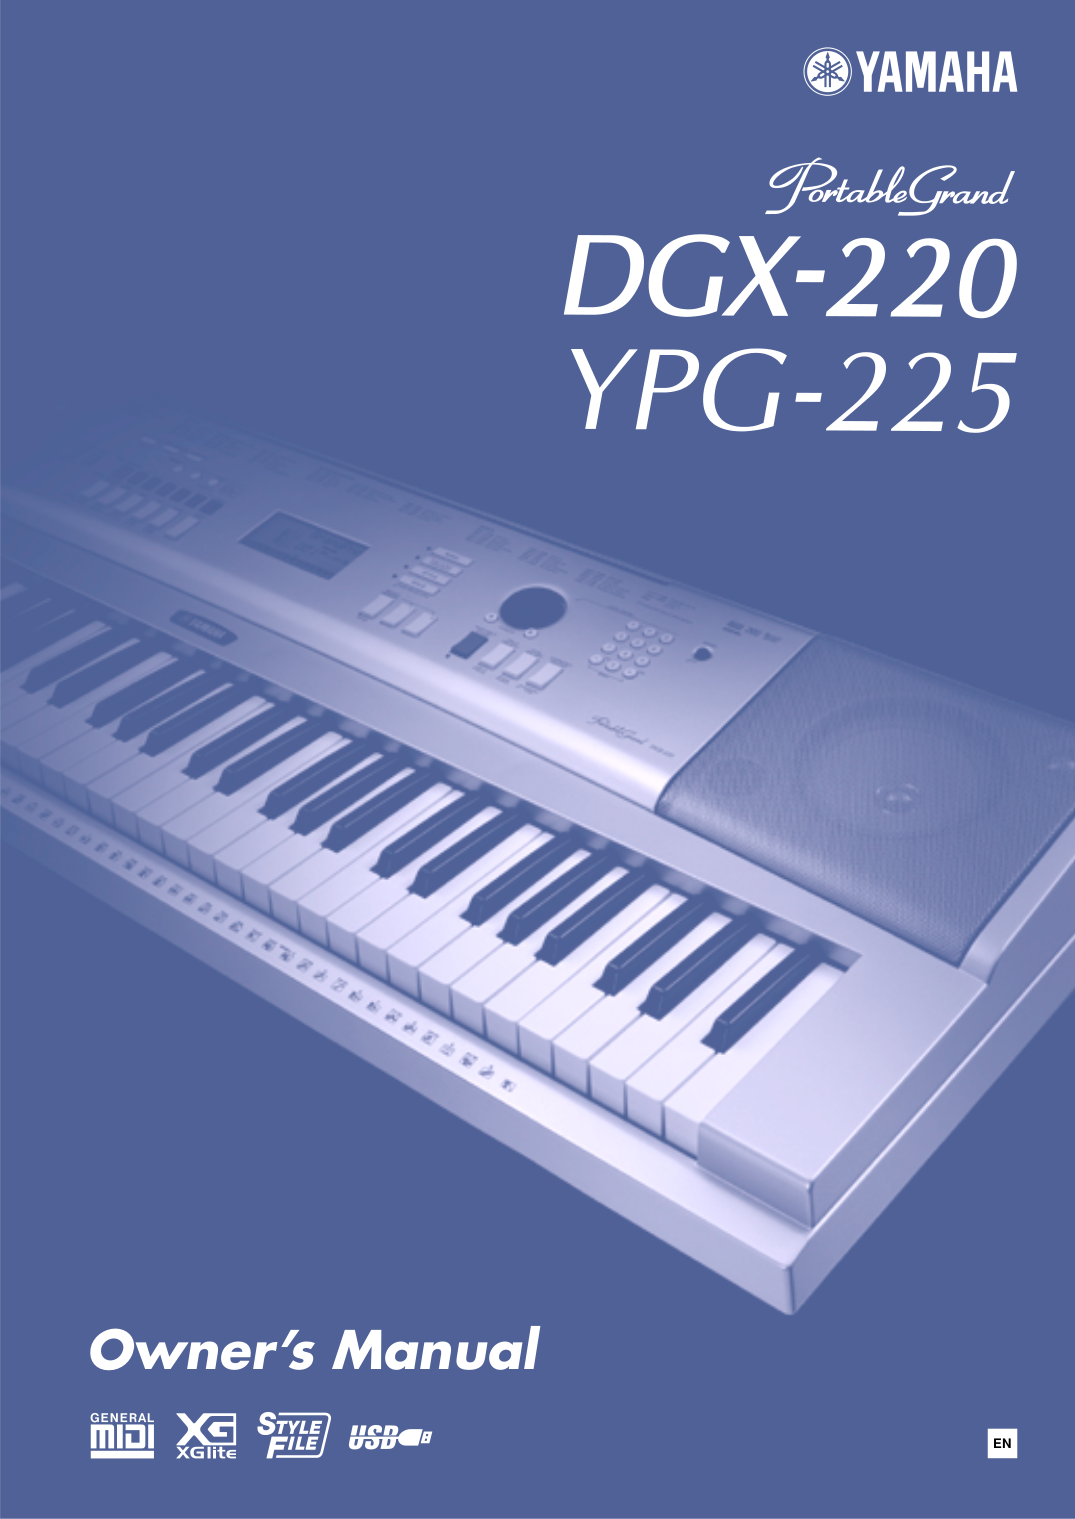 download free pdf for yamaha dgx 205 music keyboard manual rh umlib com yamaha dgx-205 service manual yamaha dgx-205 manual pdf